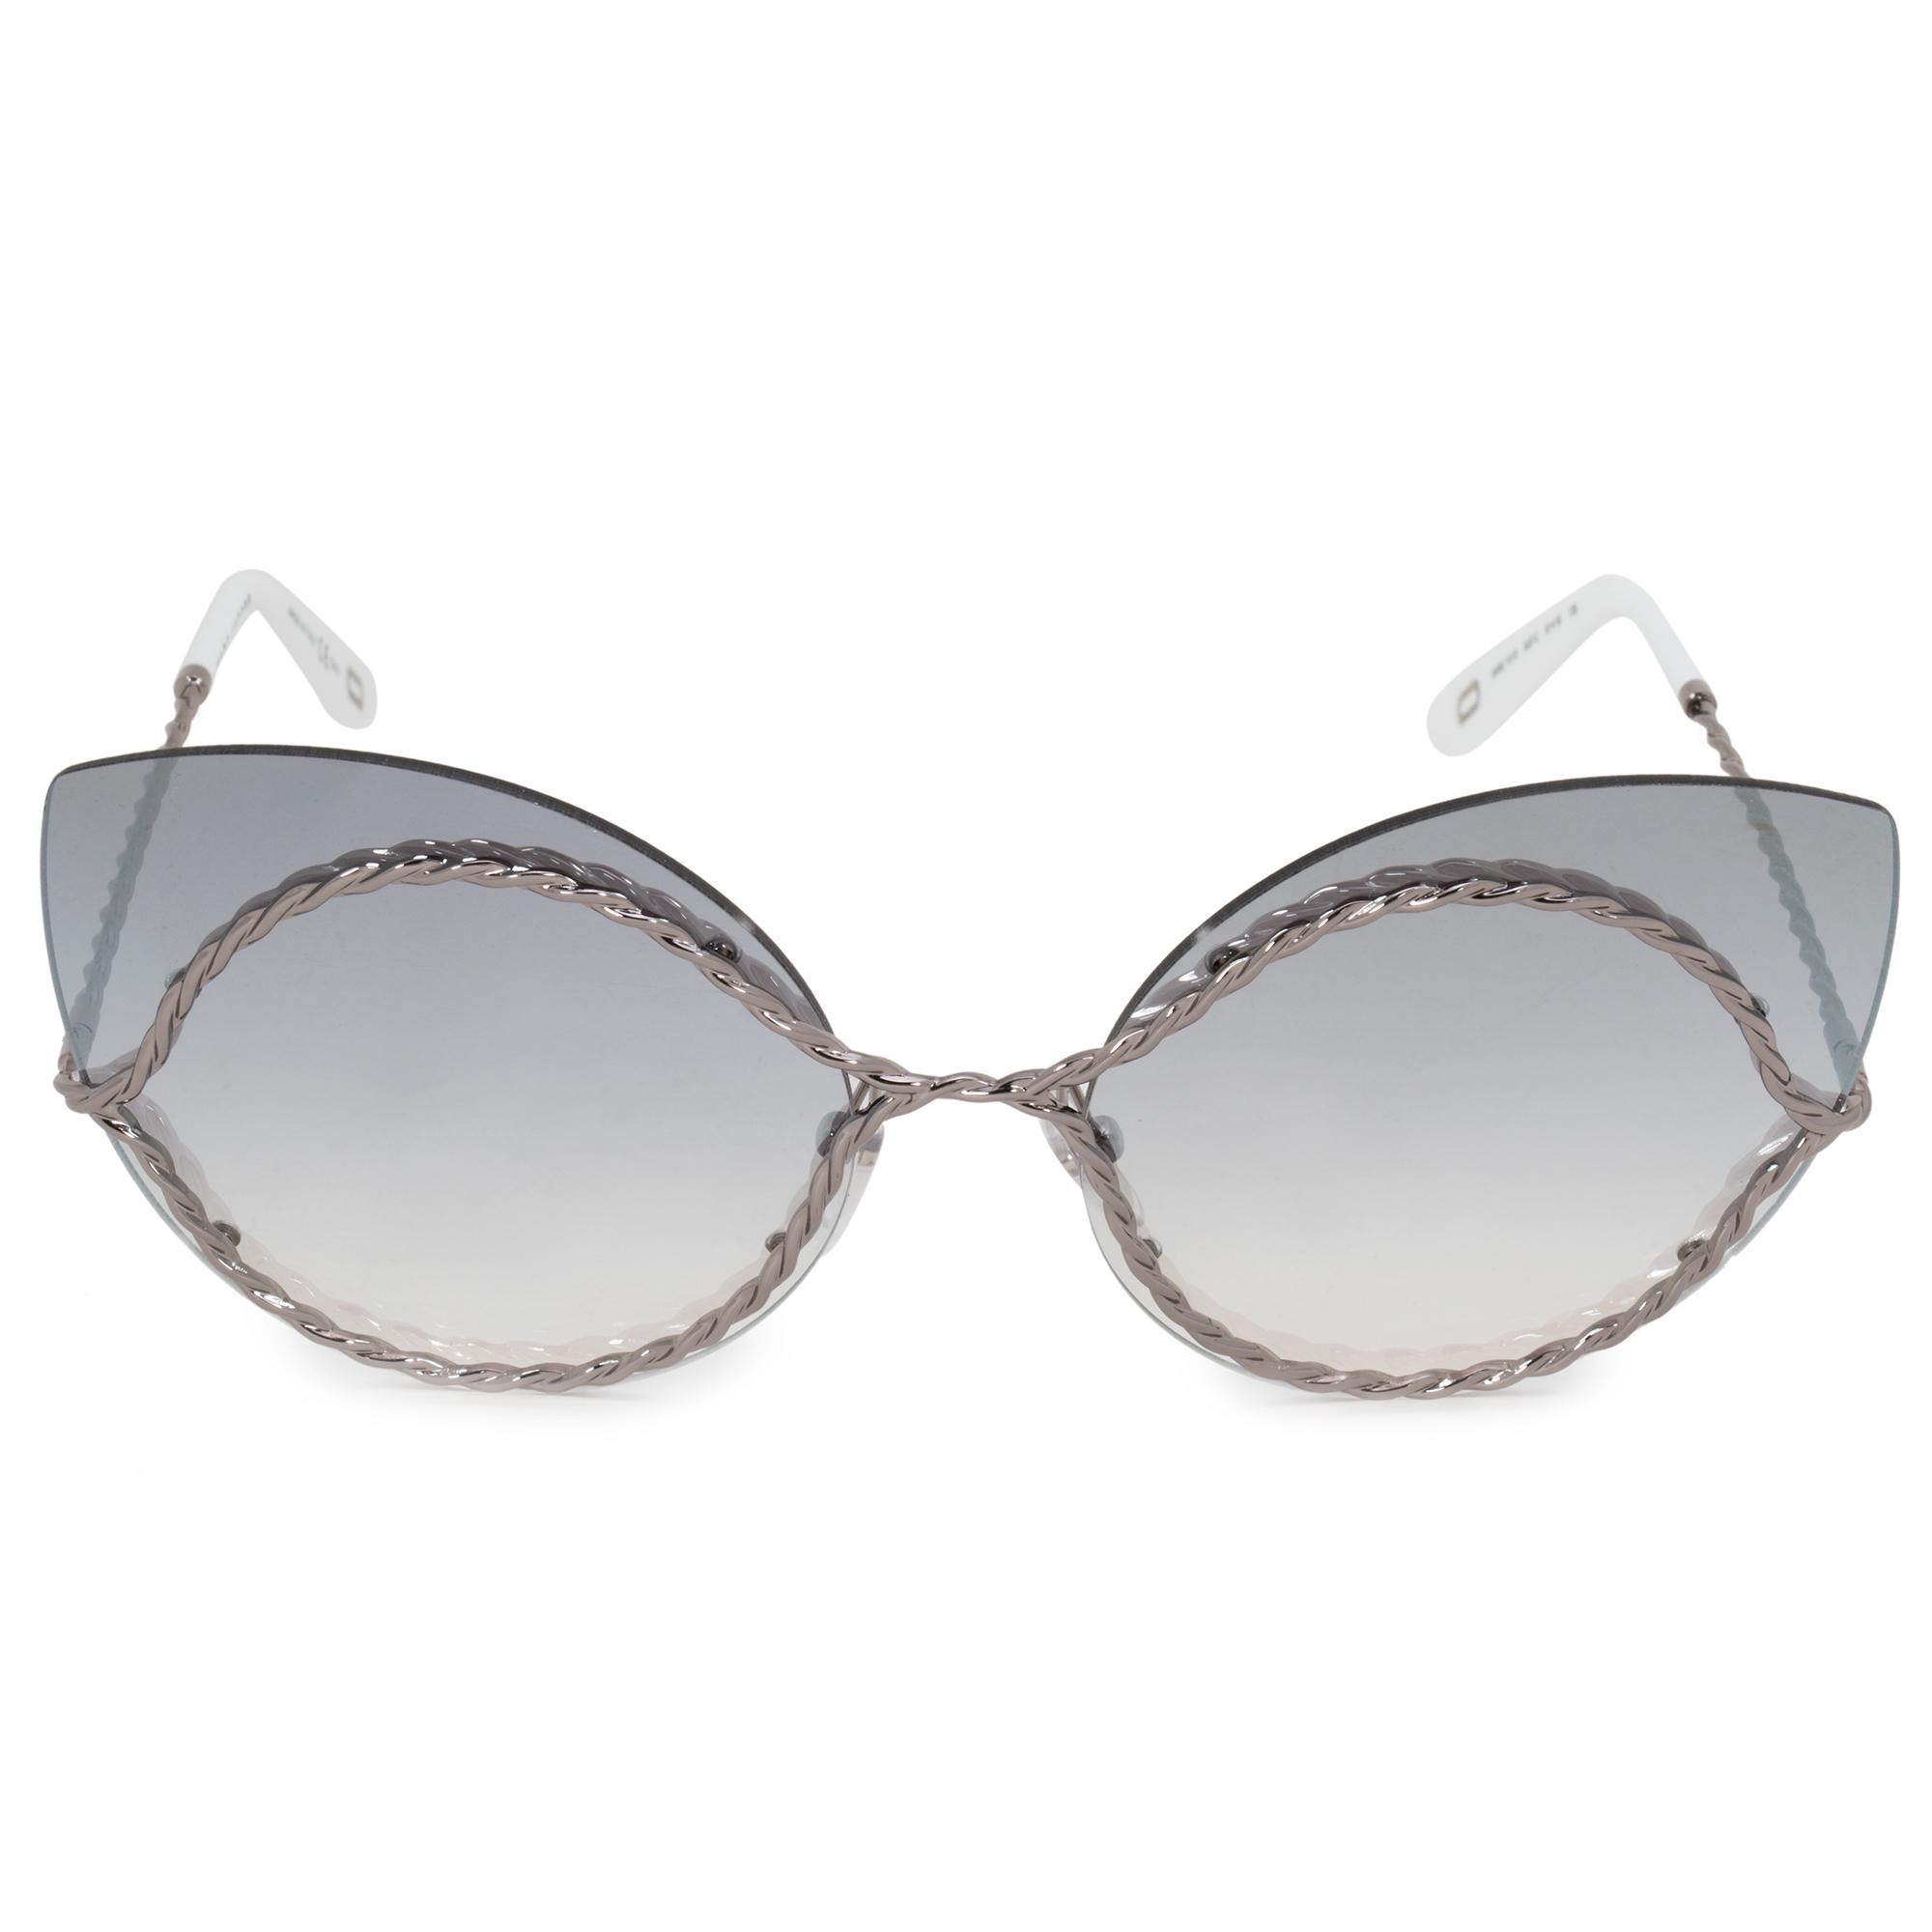 8b42ed0dd9d Marc Jacobs Marc Jacobs Cat Eye Sunglasses MJ161S 6LB IC 61 ...